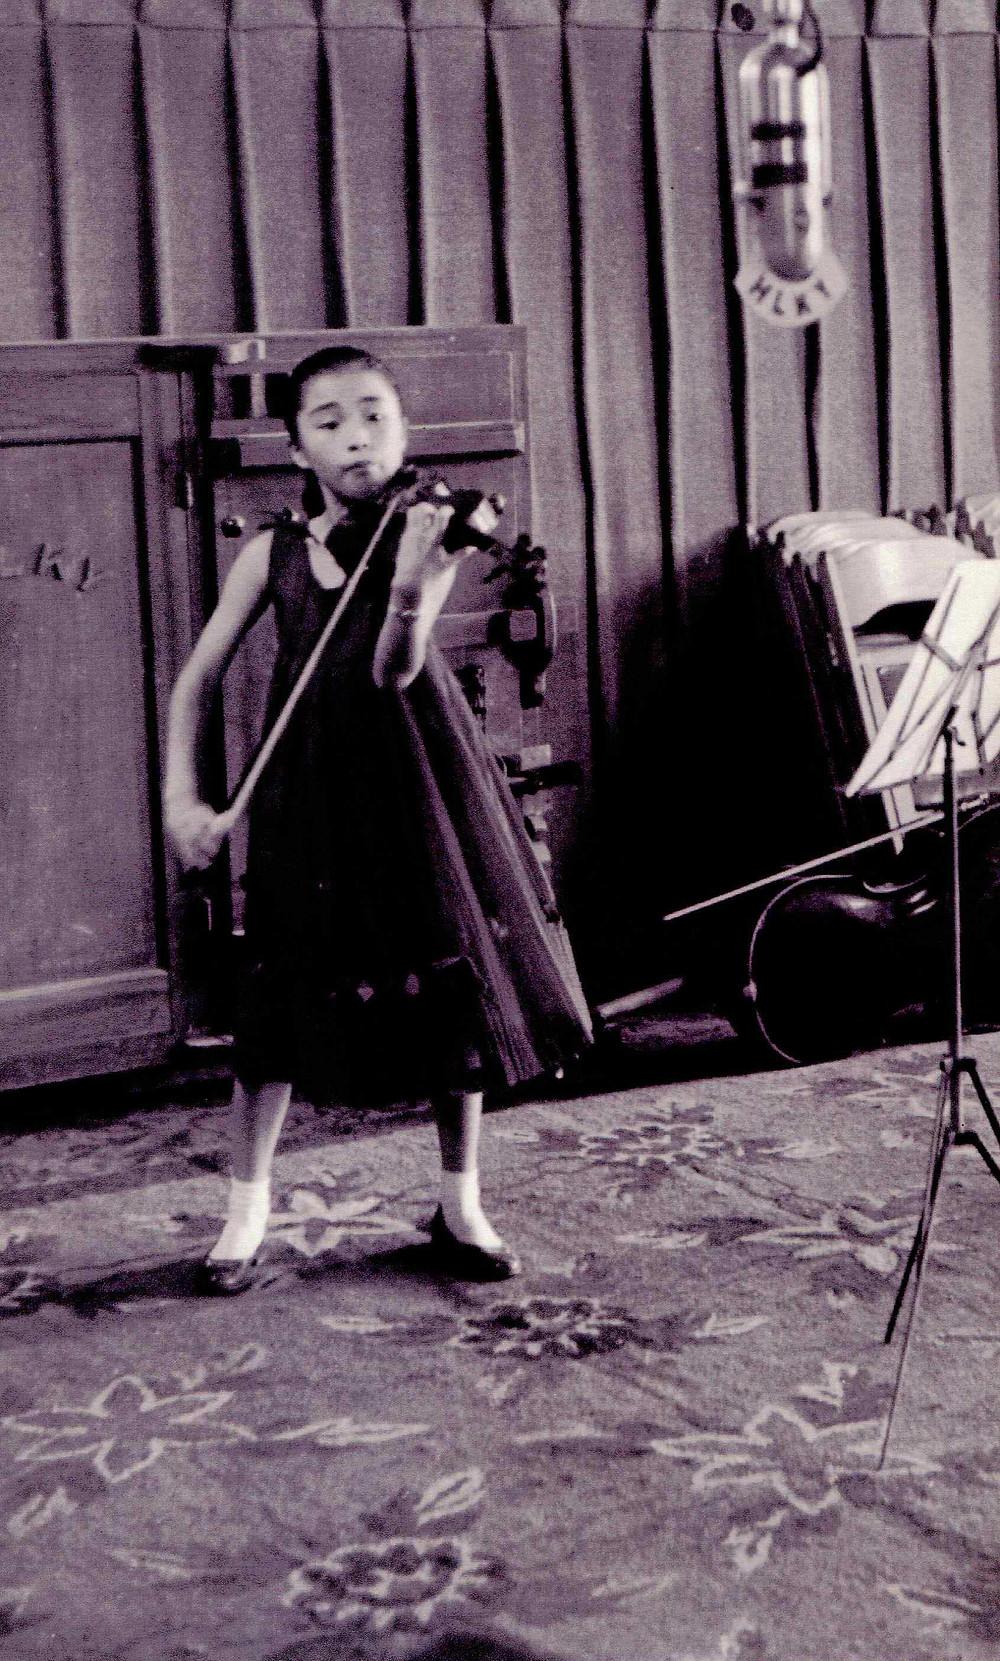 Kyung Wha Chung aged 13